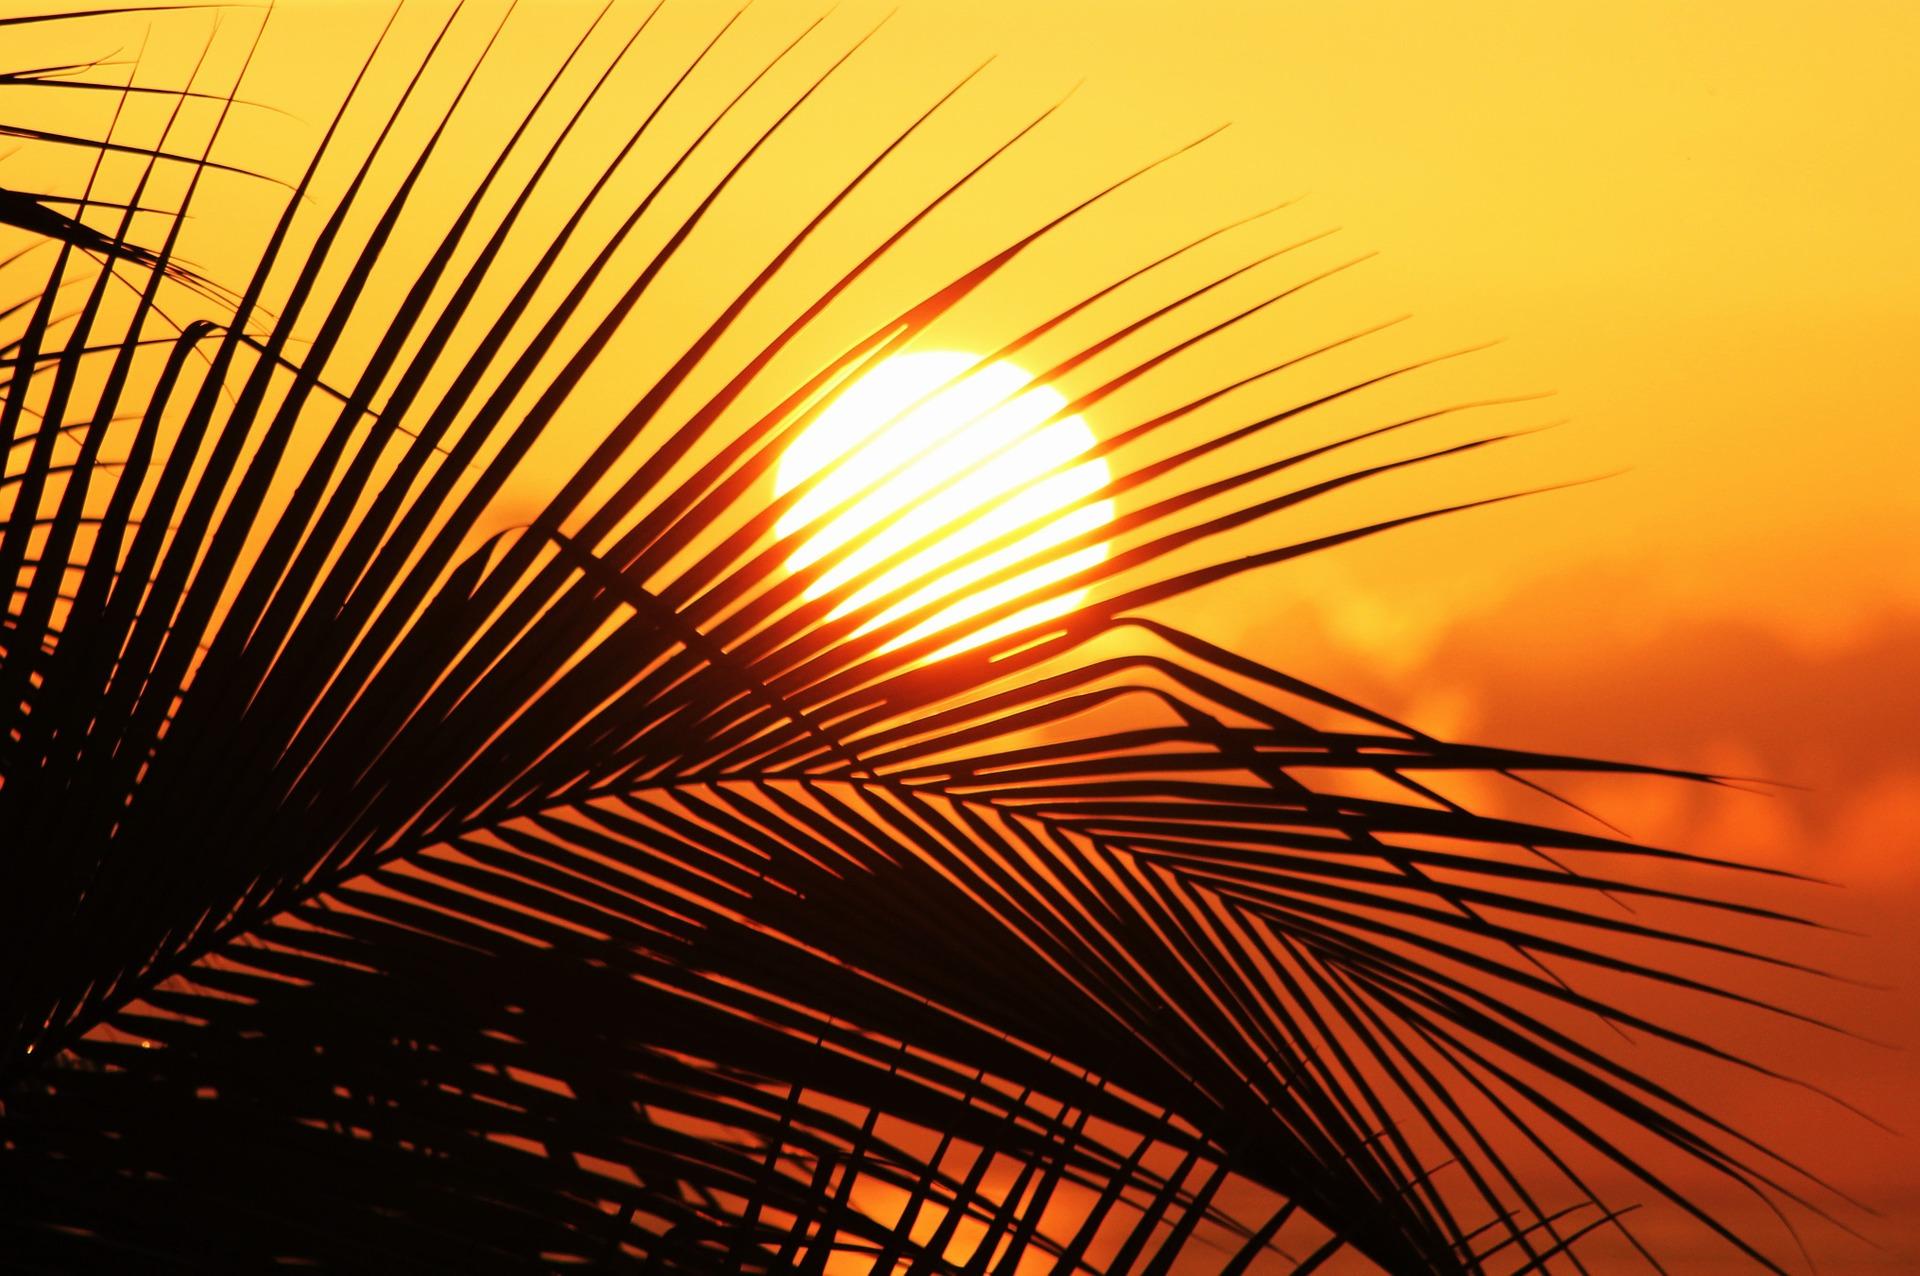 sun-of-jamaica-910070_1920